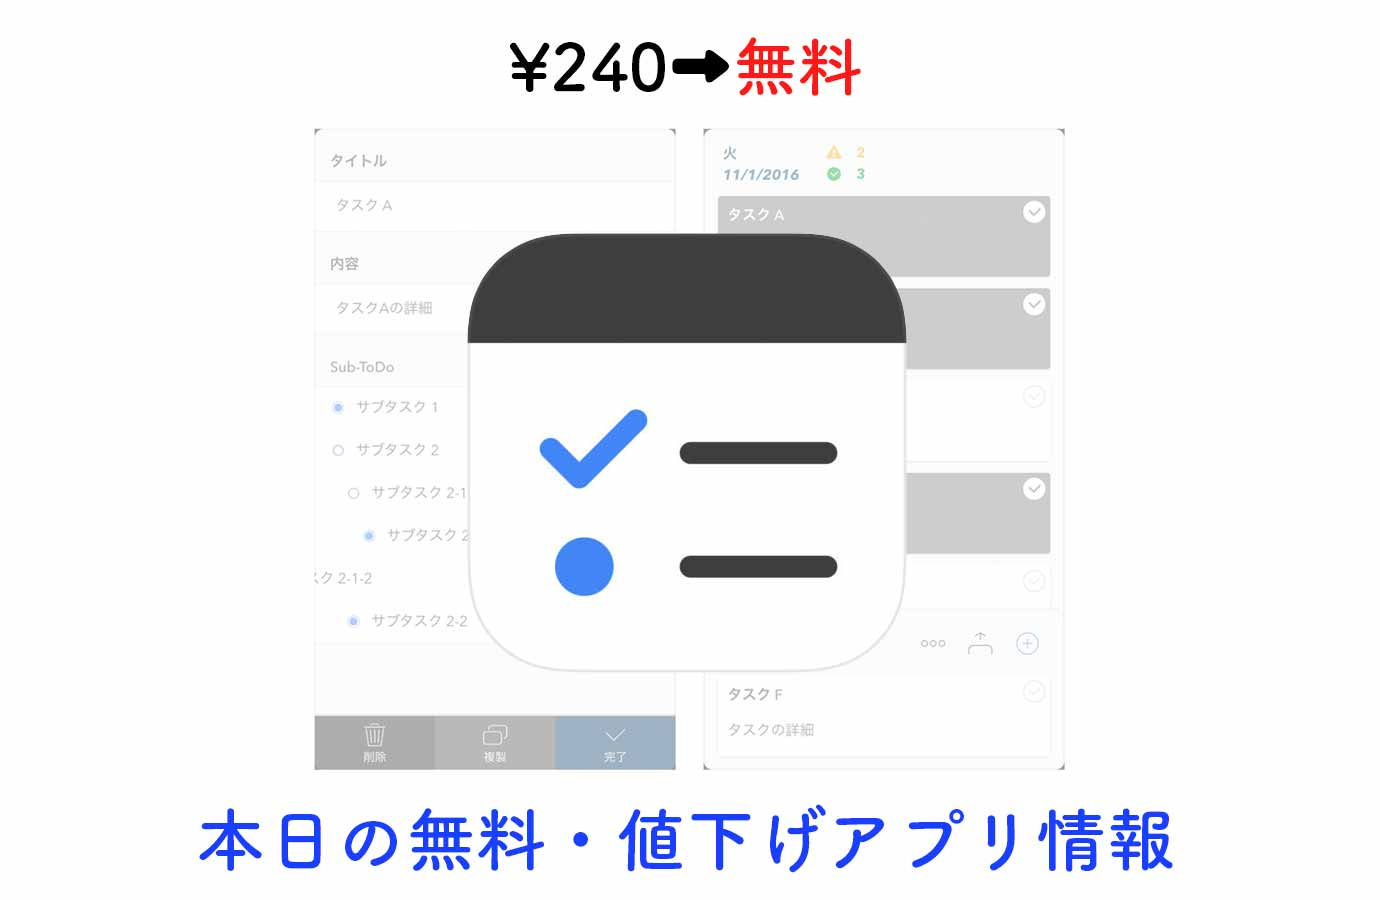 Appsale0804